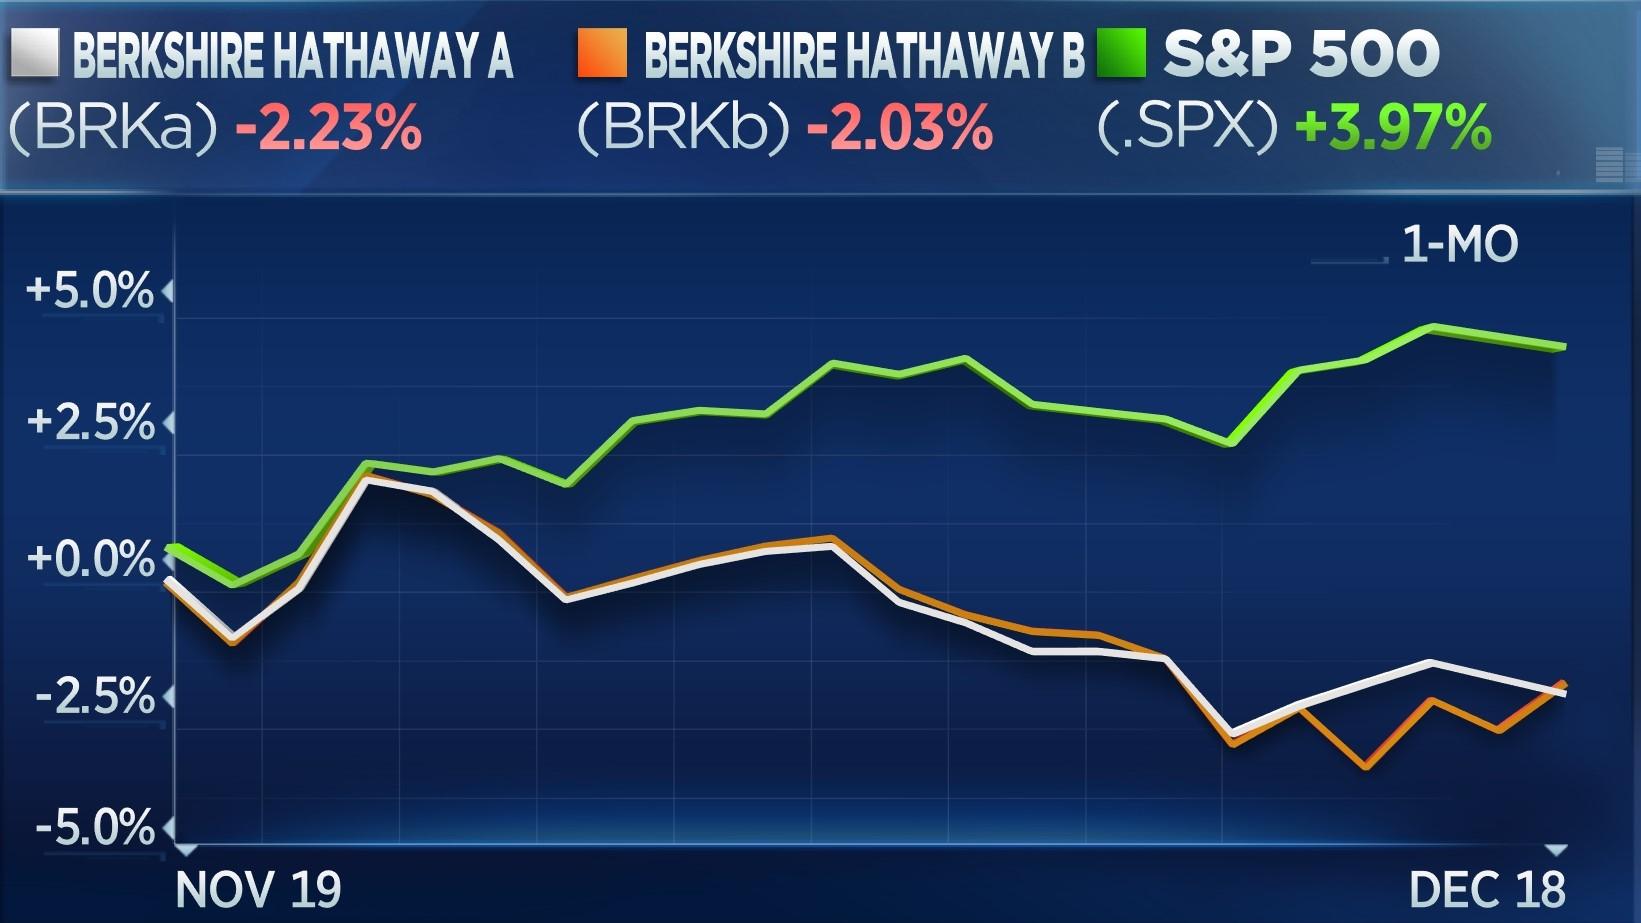 BRKA -2.23% vs BRKB -2.03  vs S&P +3.97% - 1 month